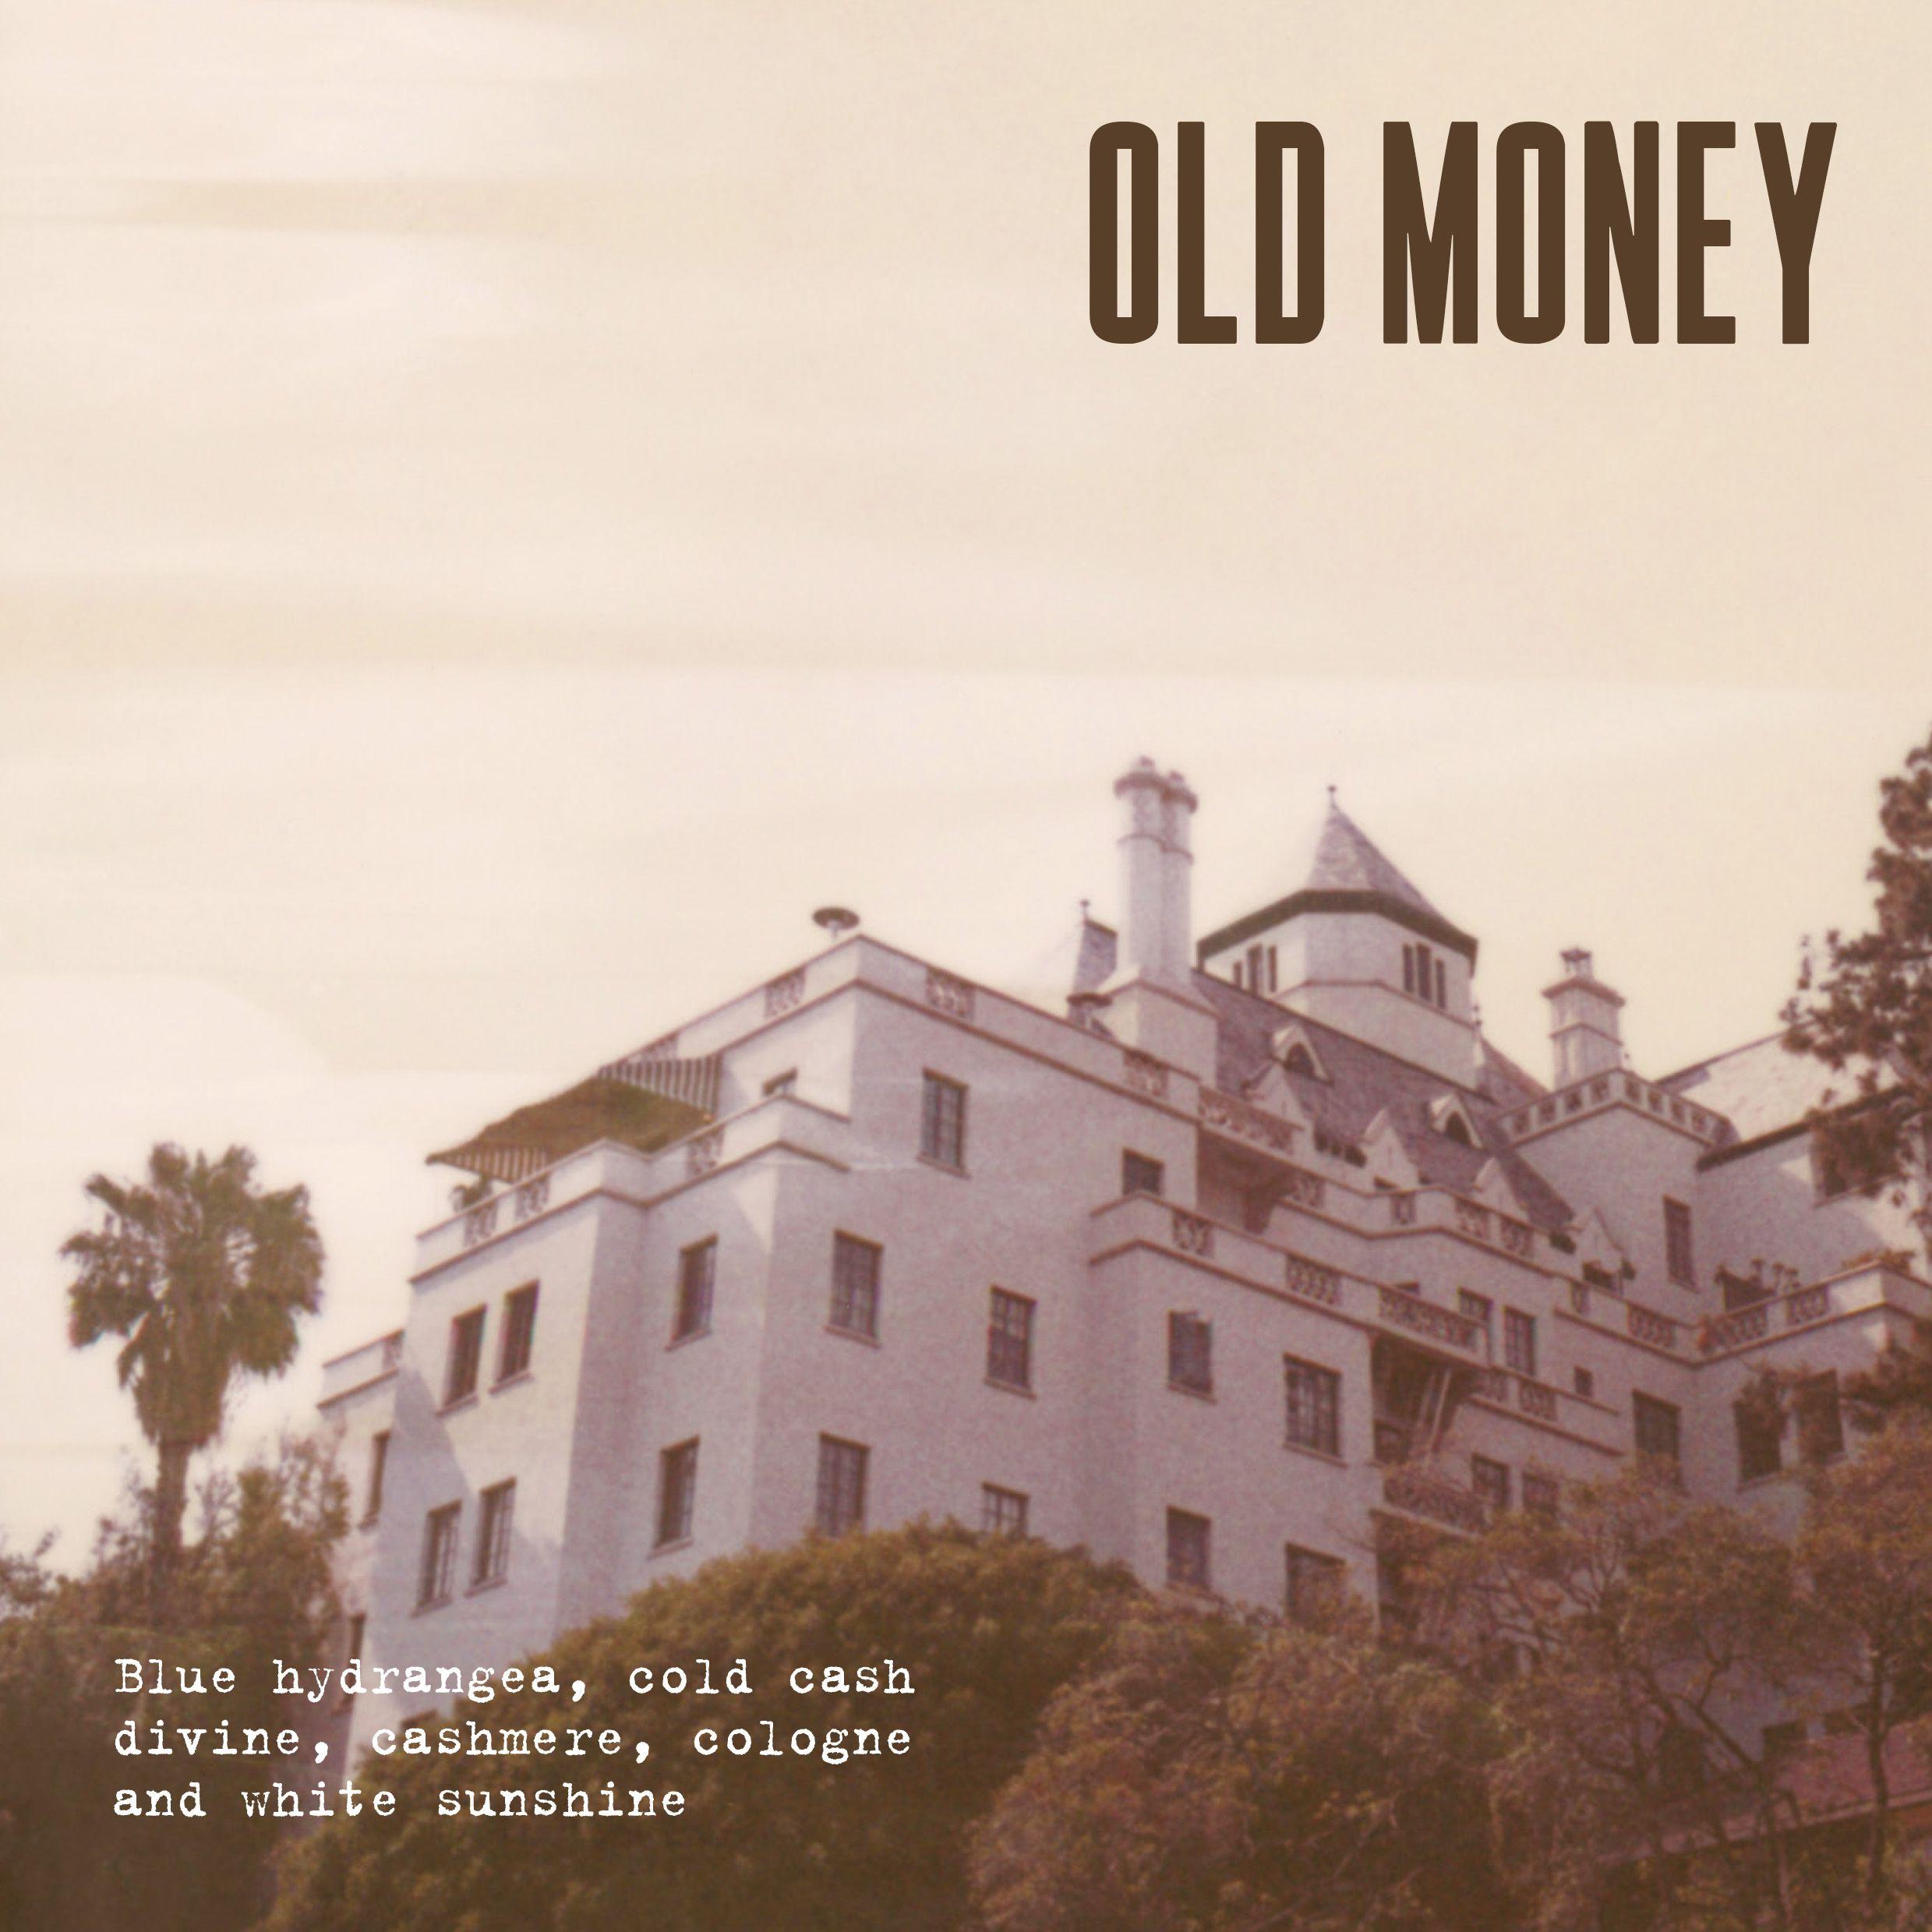 Old Money Single Lana Del Rey 2014 Photographed By Neil Krug Myan Soffia Font Rainbow Old Money Lana Del Rey Lana Del Rey Lyrics